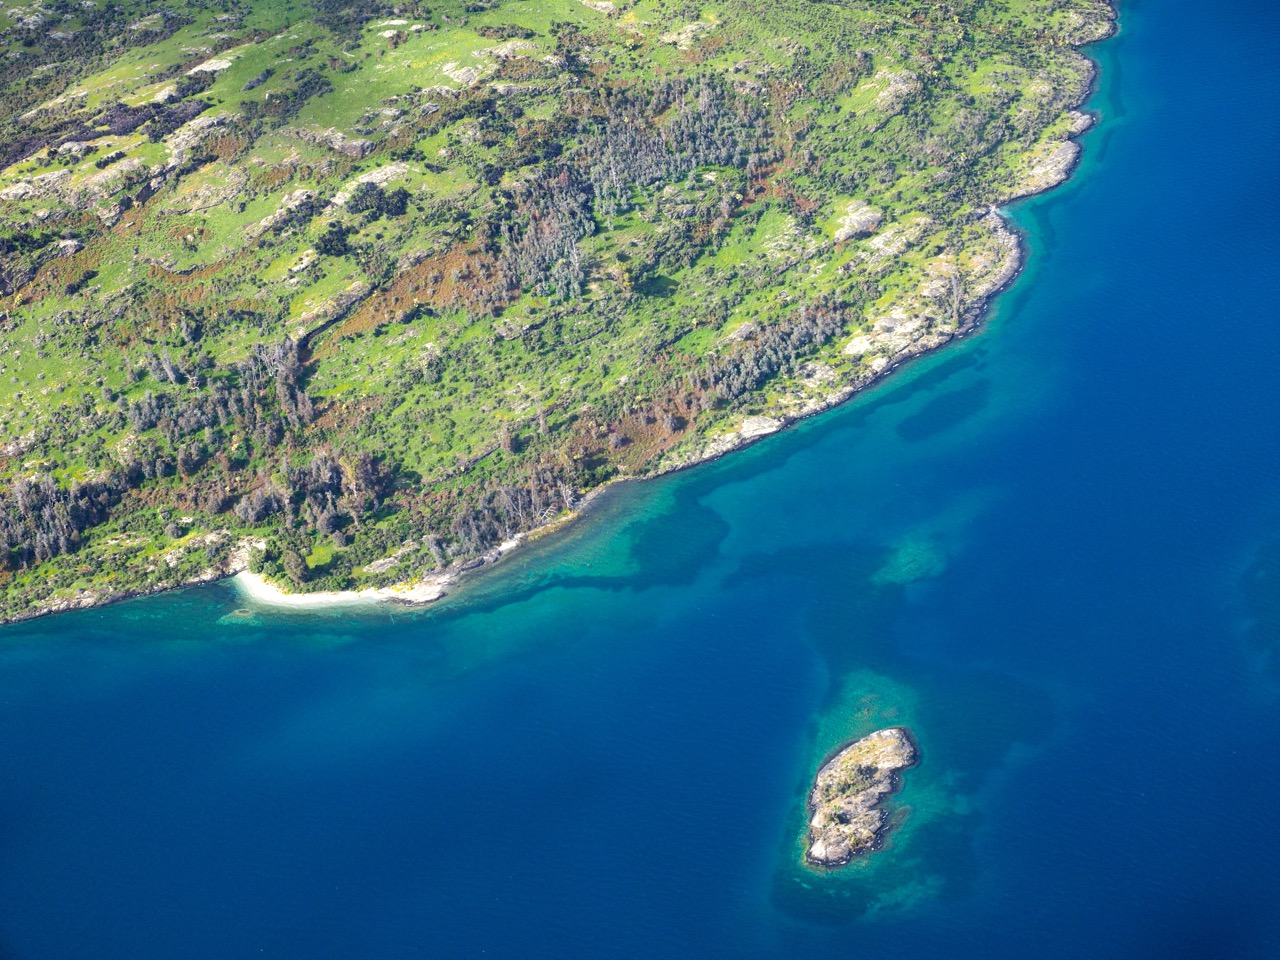 Les rives du Lac Wakatipu